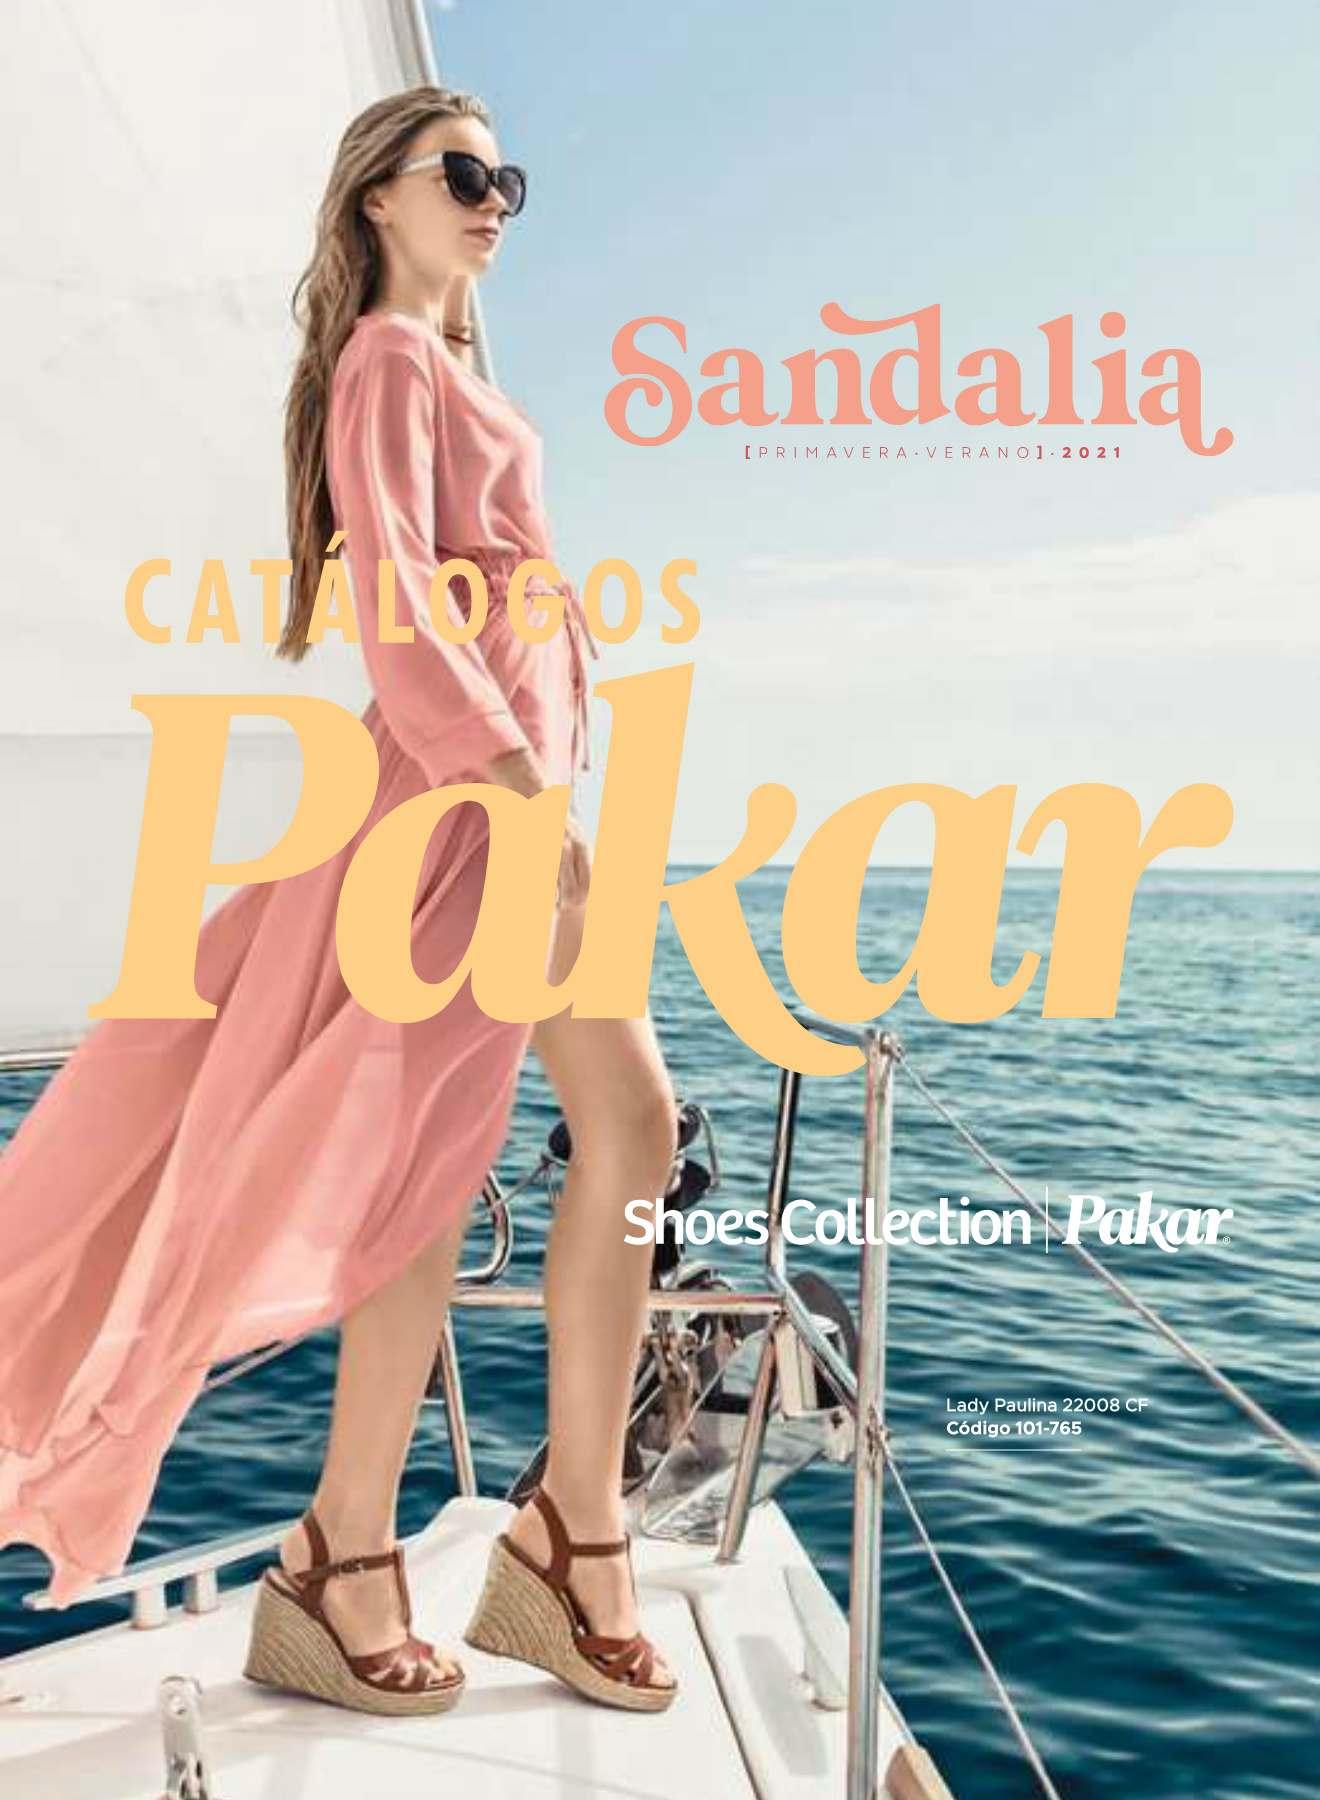 CATALOGO SANDALIAS